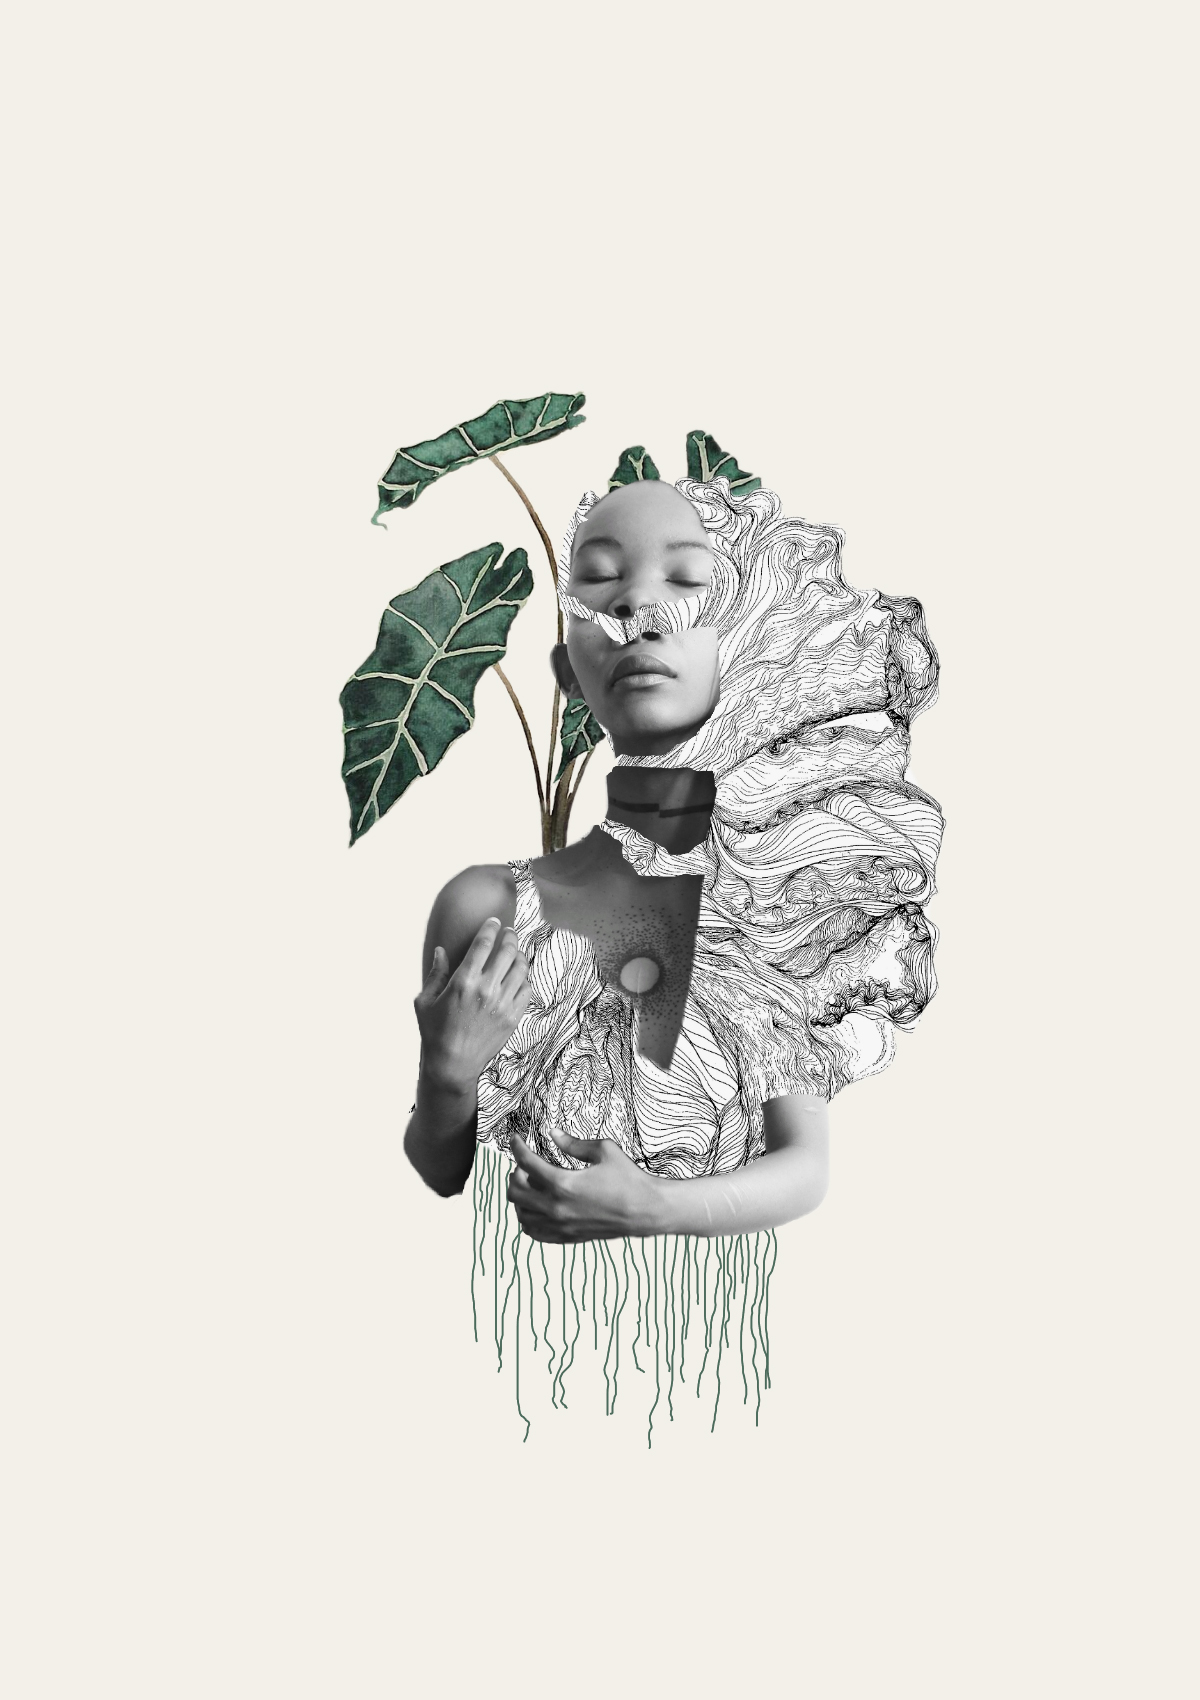 Keneilwe Mokoena, #8019, 2019  Digital Collage  148 x 210 mm  Ed: 10  R 2100 (Unframed)